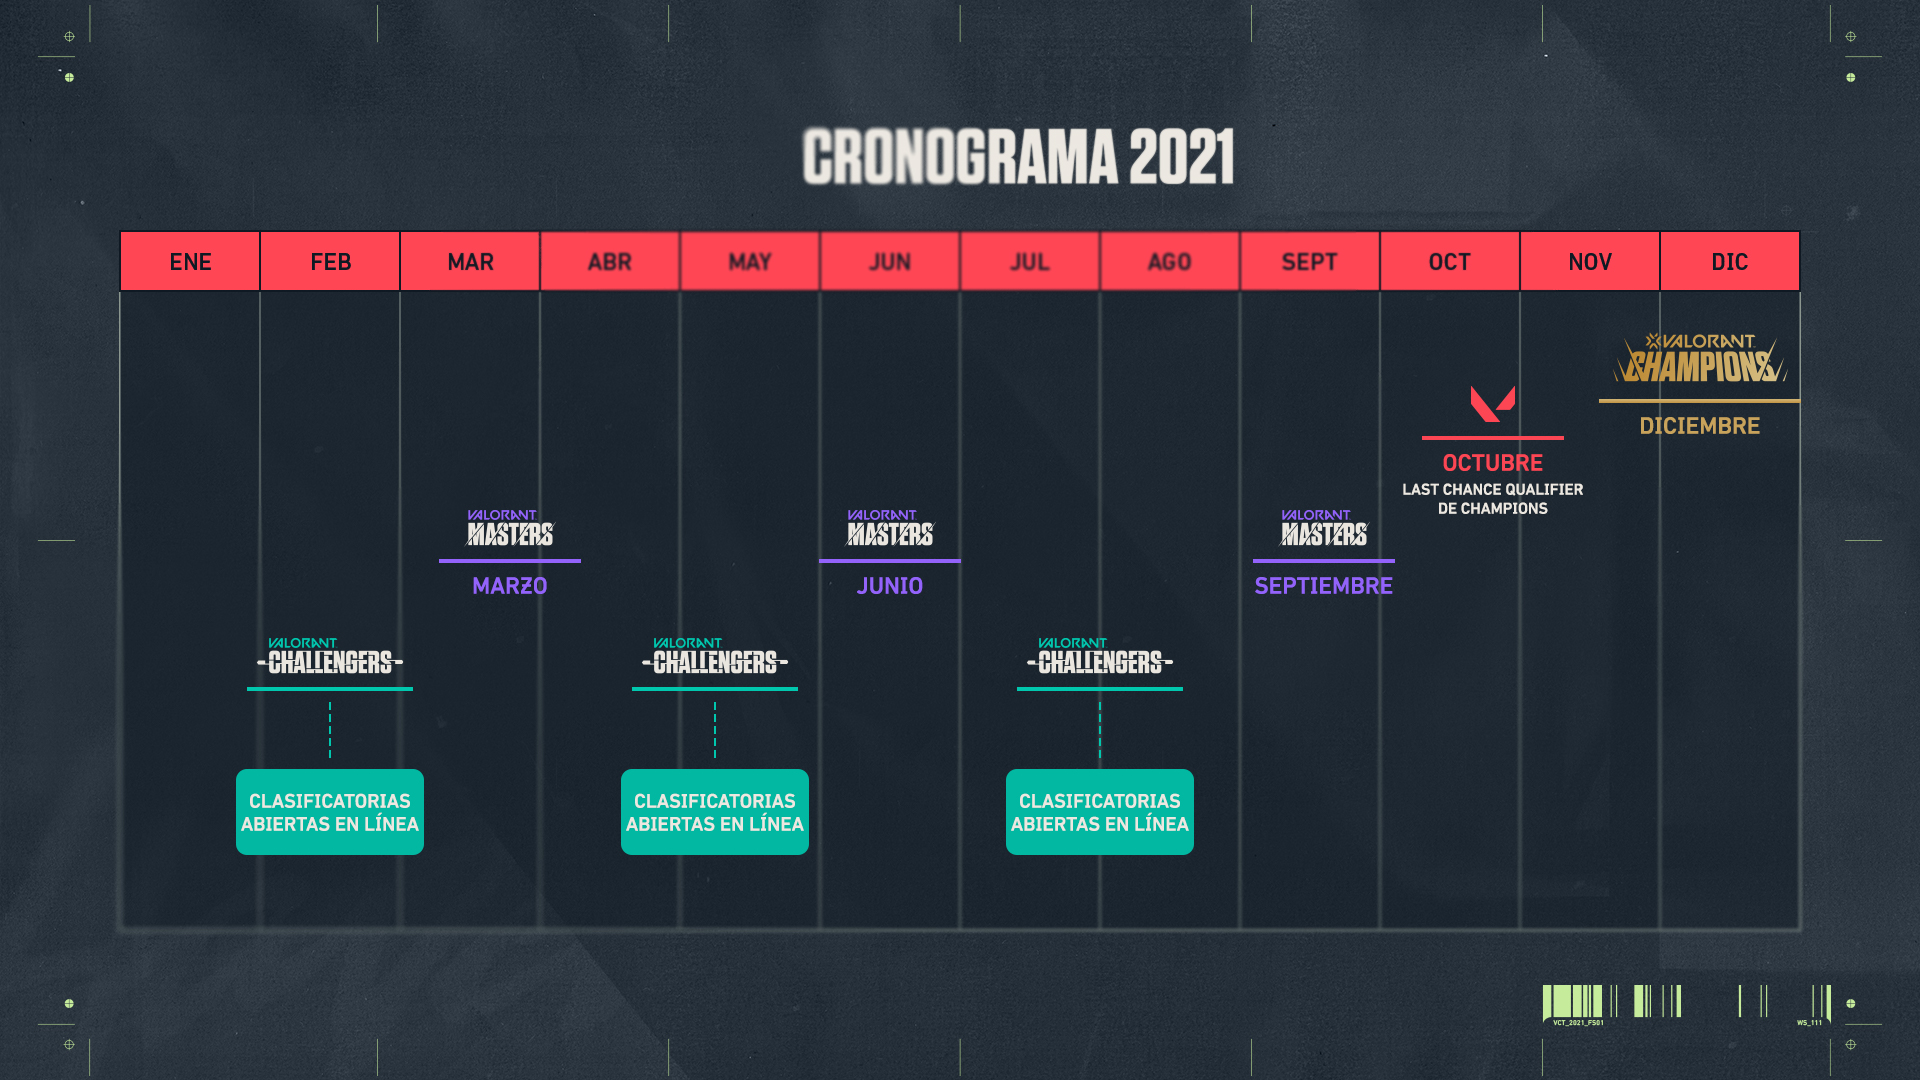 Cronograma Torneo de Valorant 2021